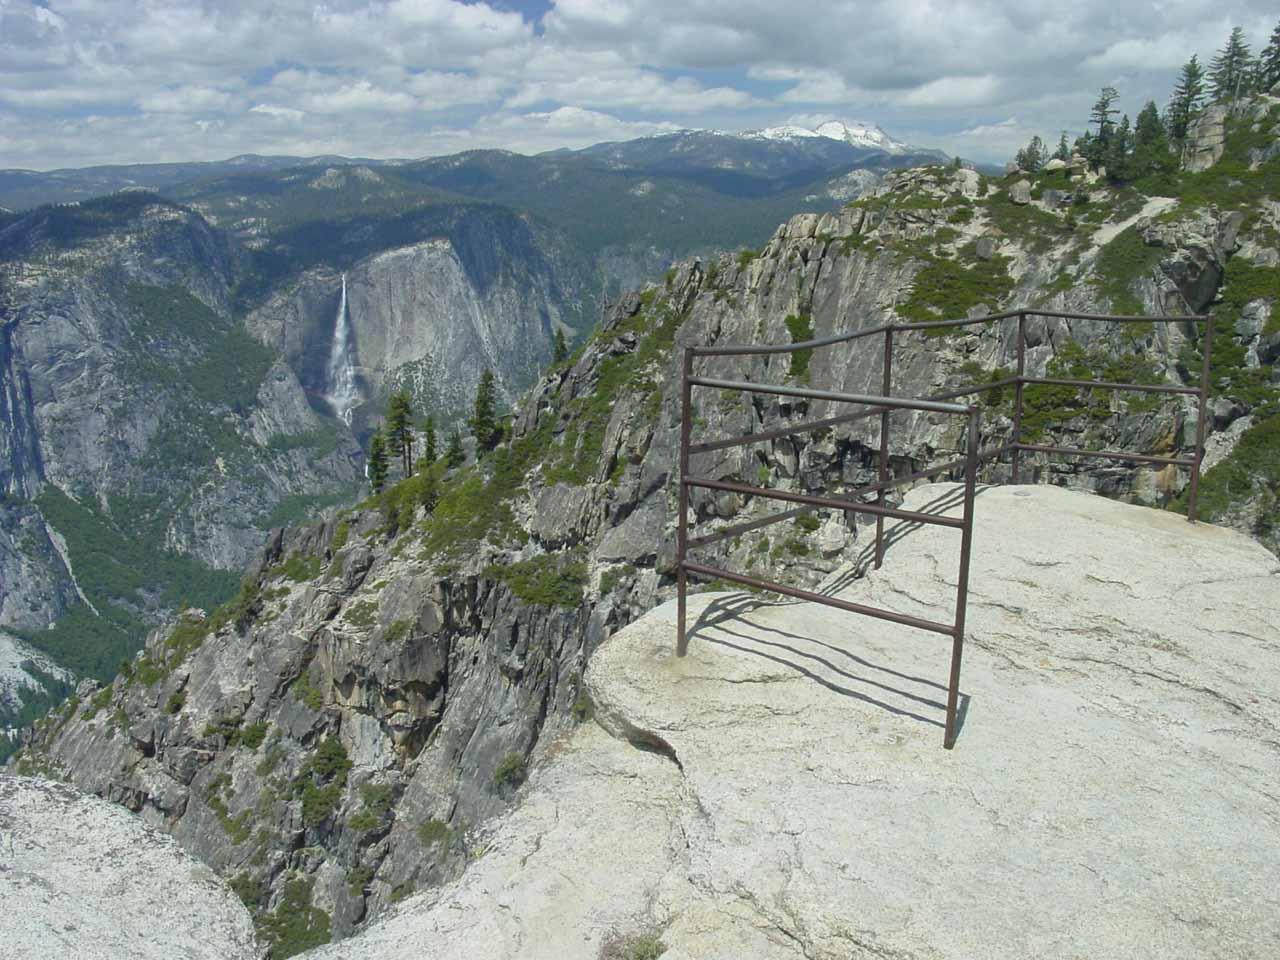 Yosemite Falls from the precipitous Taft Point